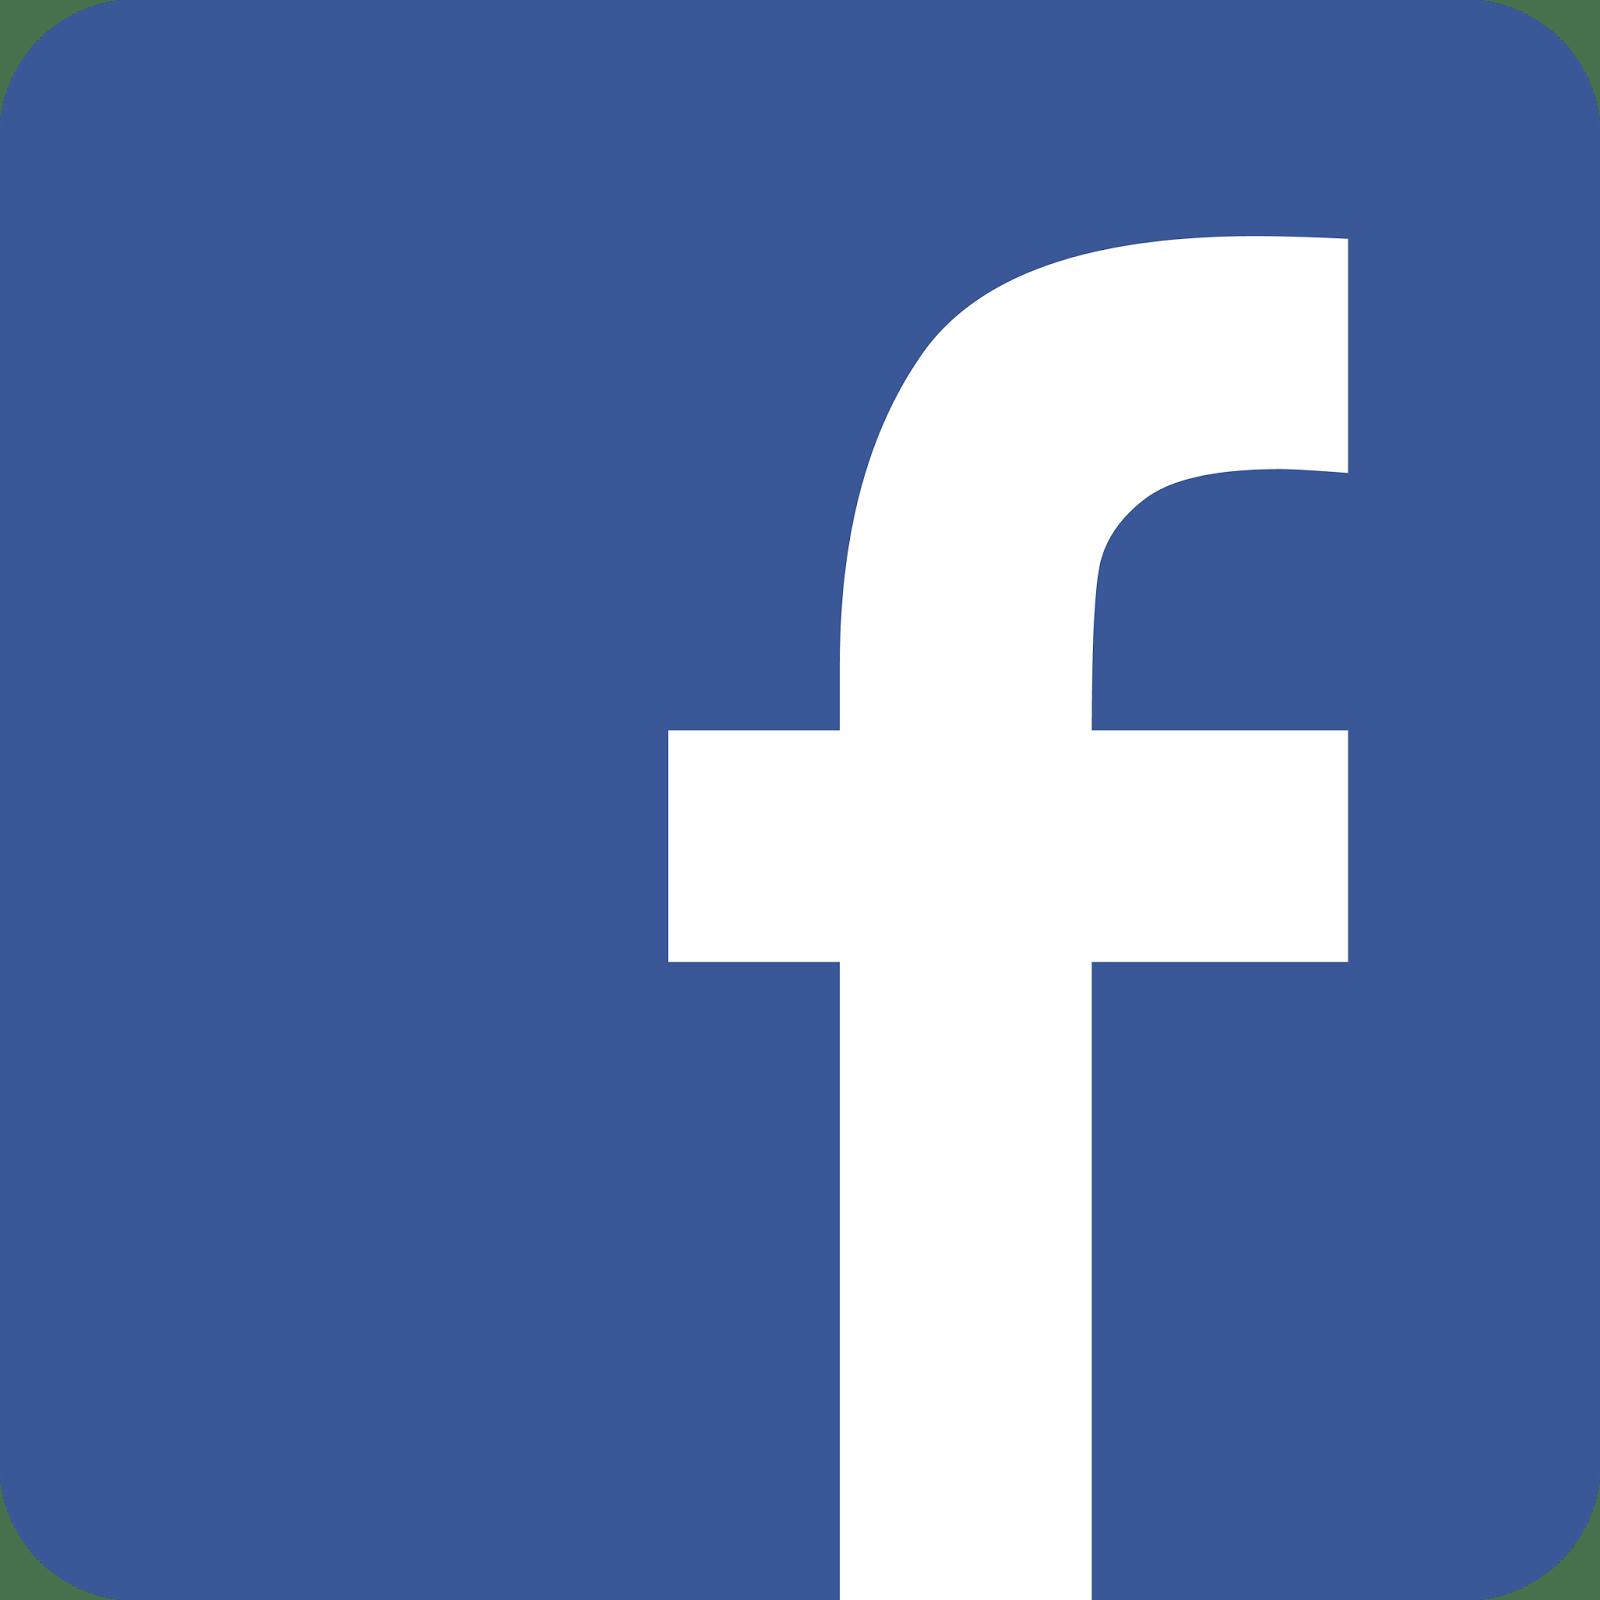 Kuvahaun tulos haulle facebook logo transparent background